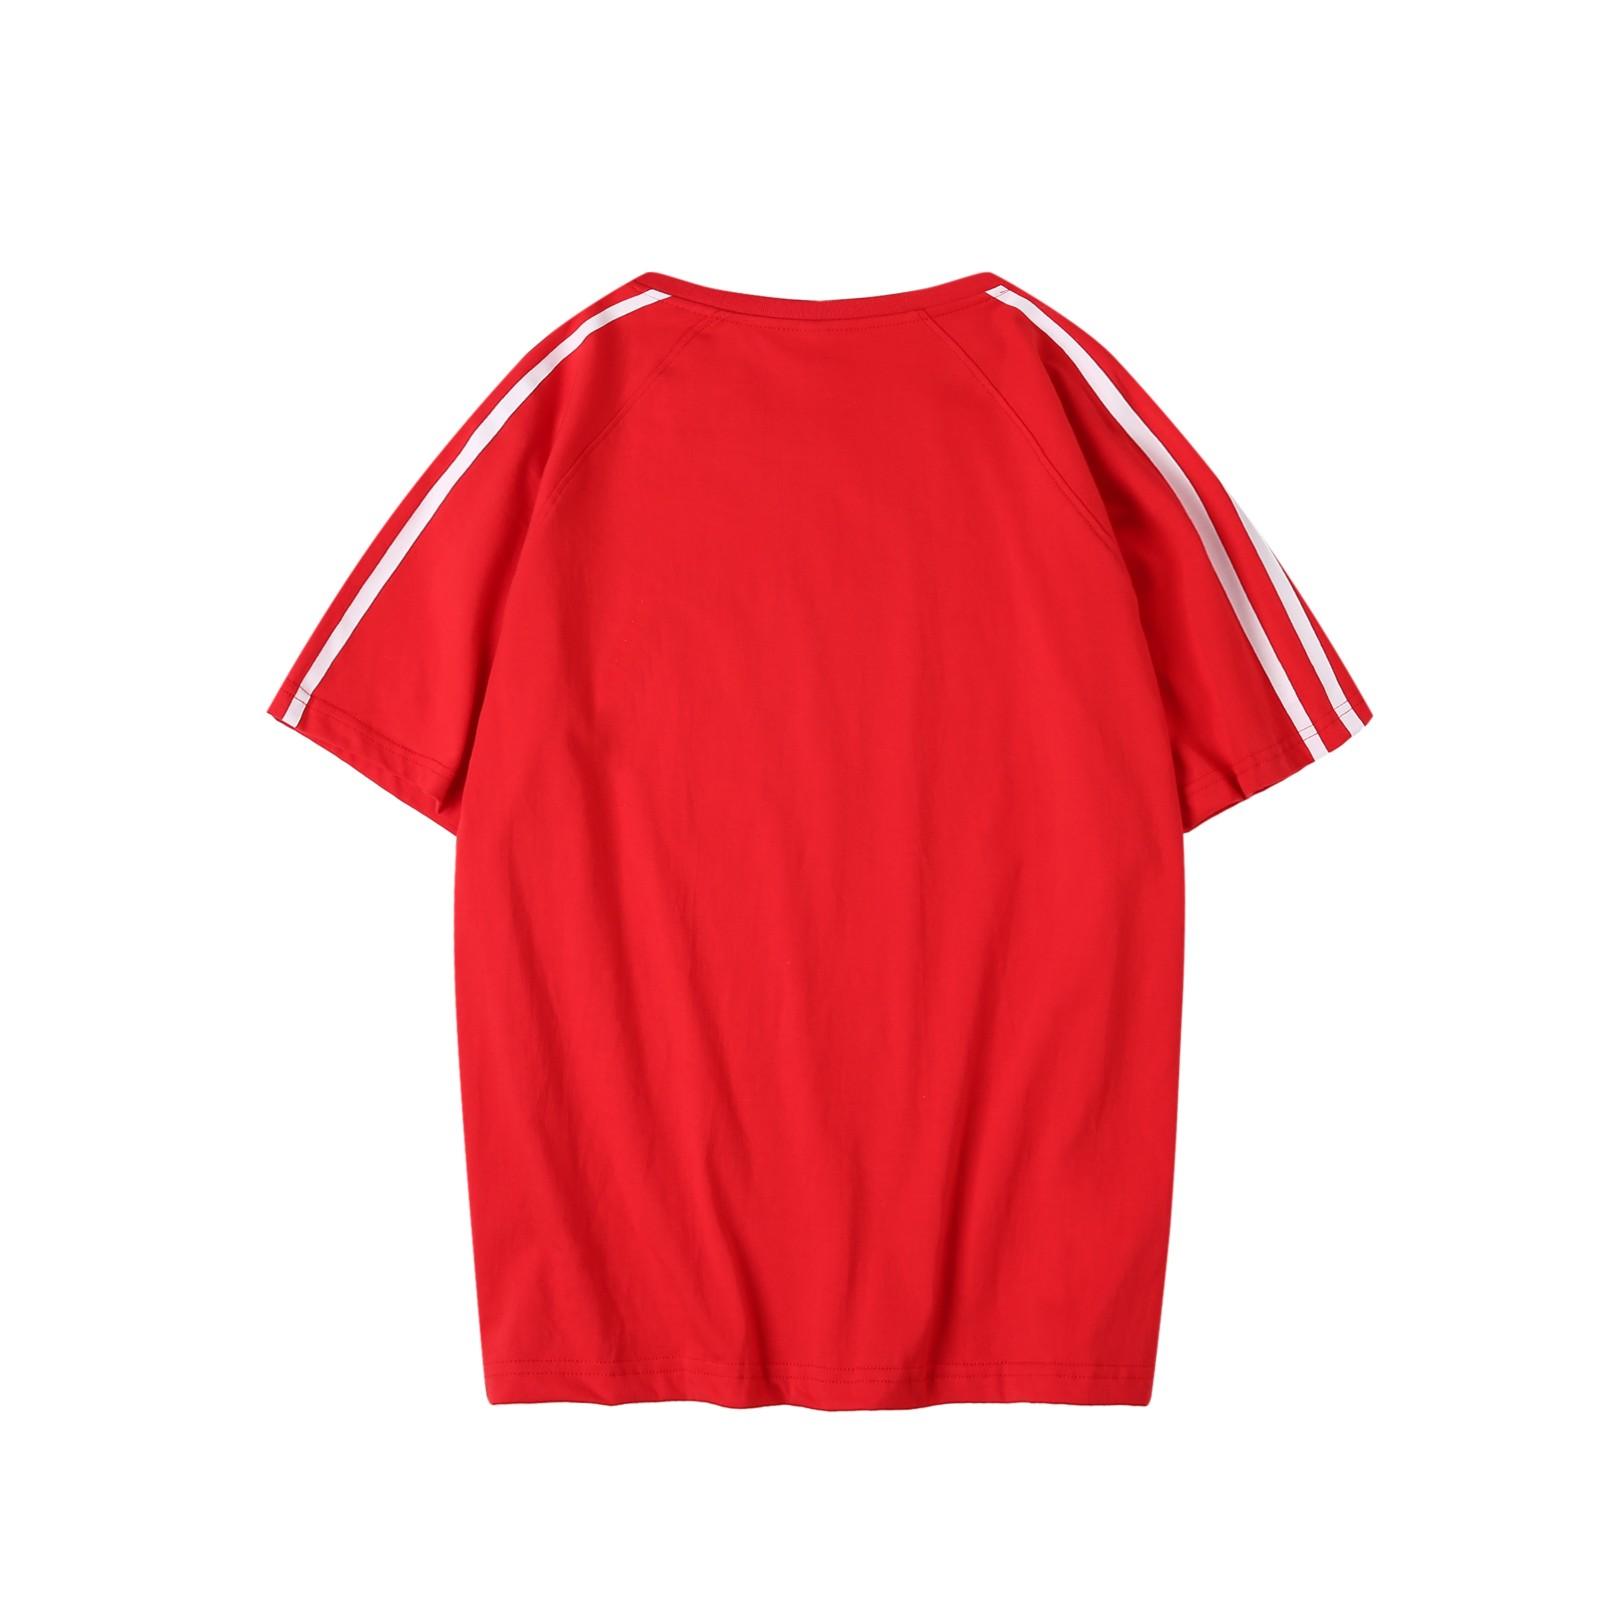 product-Ruiteng-Wholesales Summer Girls Round Neck T-Shirts Short Sleeve Women Casual T Shirt Plain